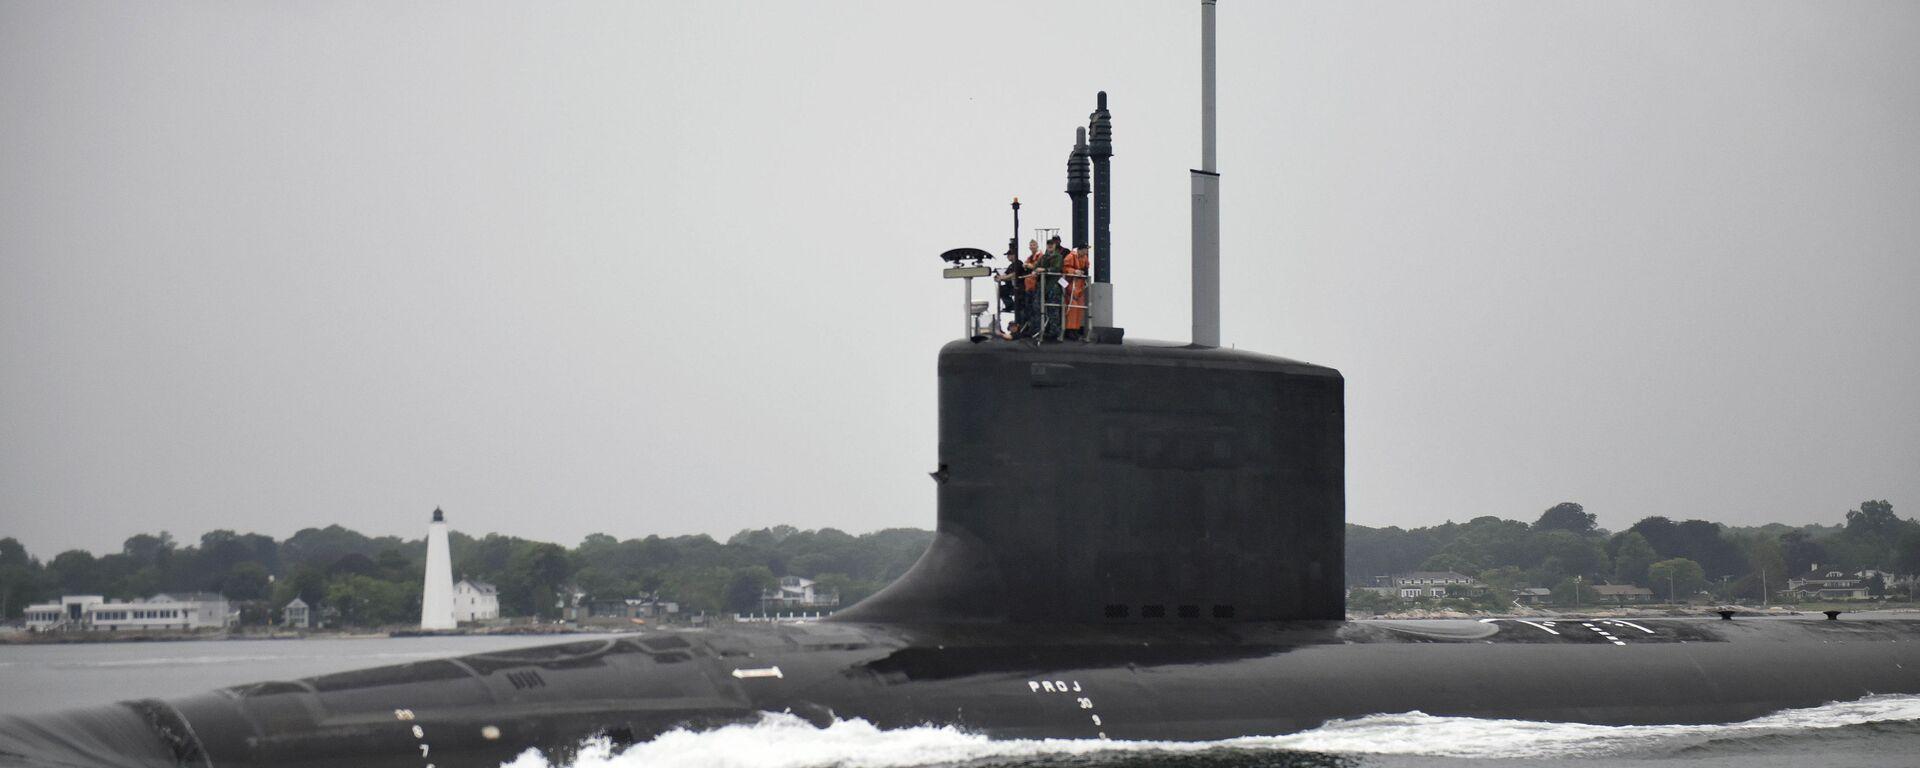 Tàu ngầm Hoa Kỳ - Sputnik Việt Nam, 1920, 08.10.2021